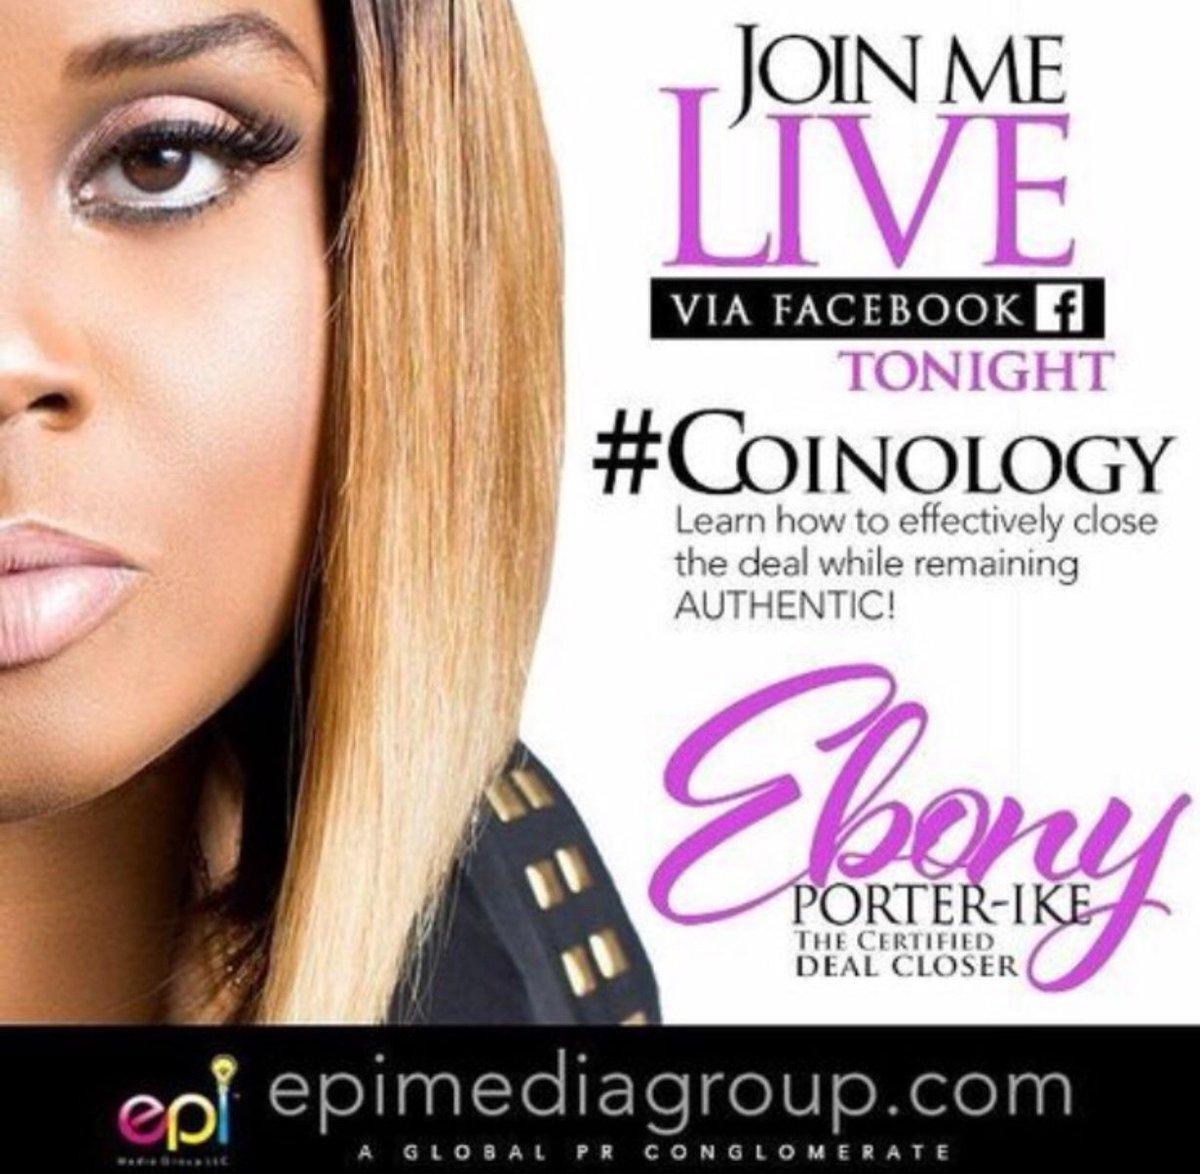 Ebony porter facebook